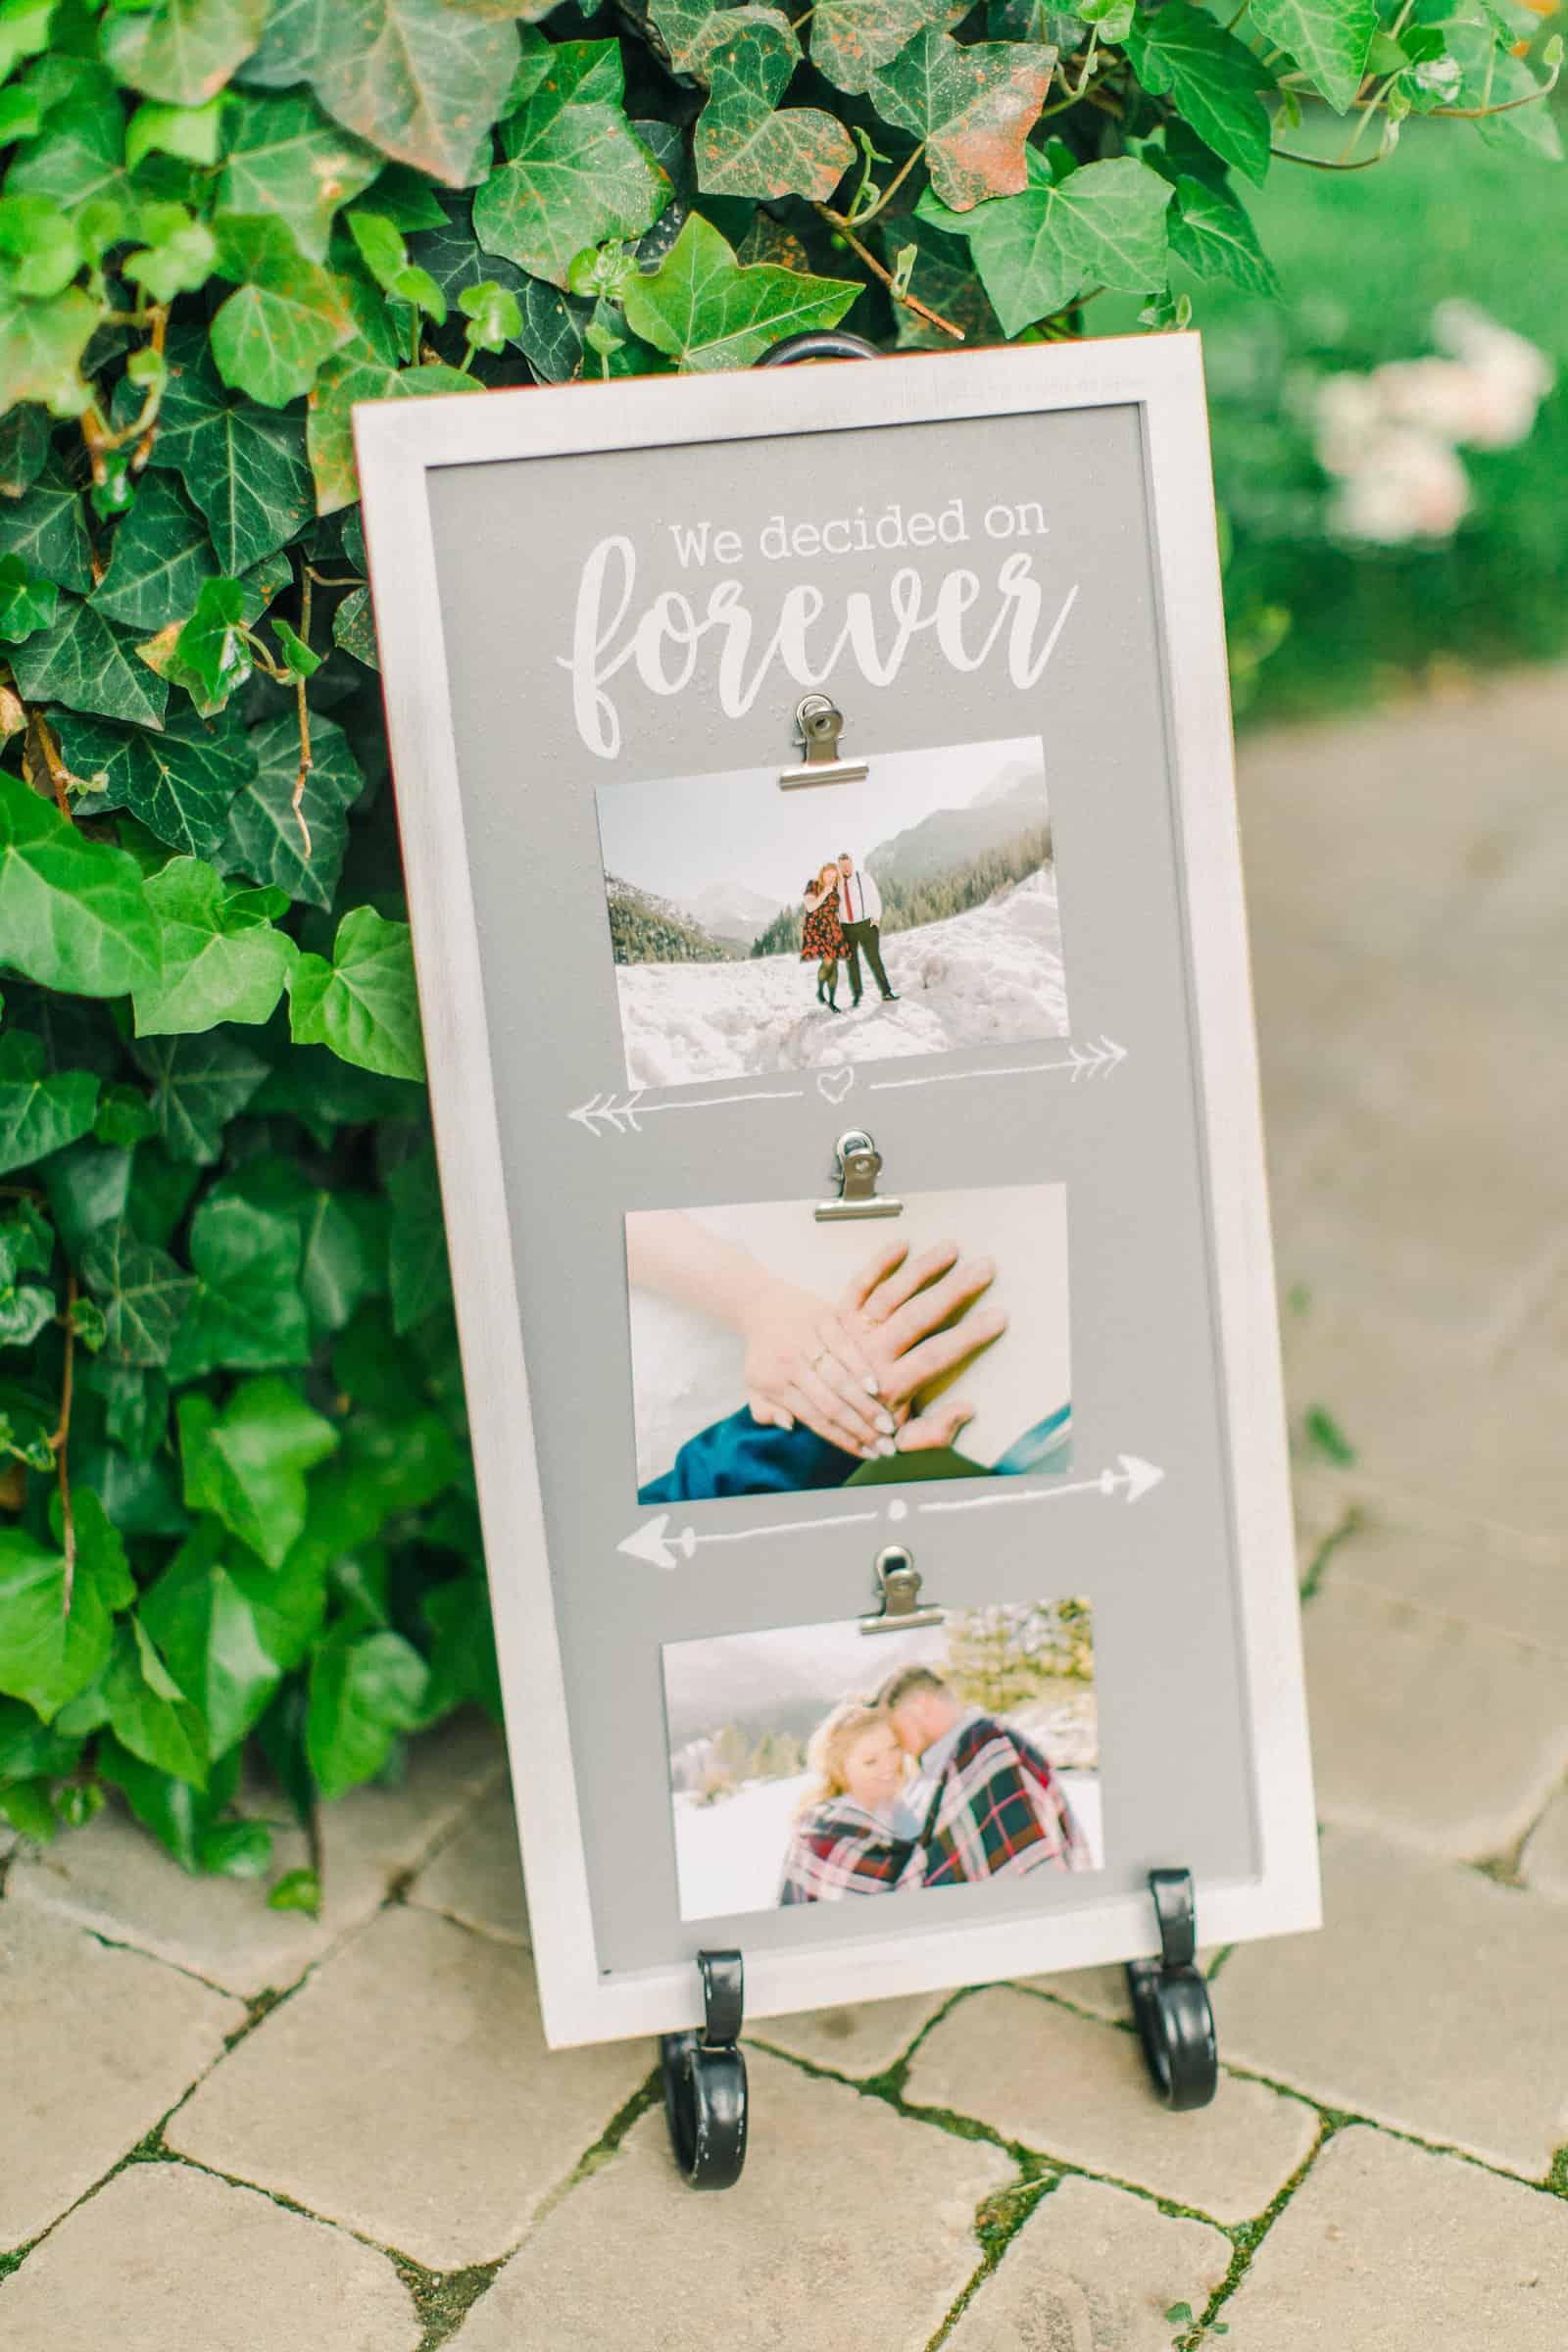 Draper LDS Temple Wedding, Utah wedding photography, summer backyard wedding, reception decor calligraphy sign we decided on forever